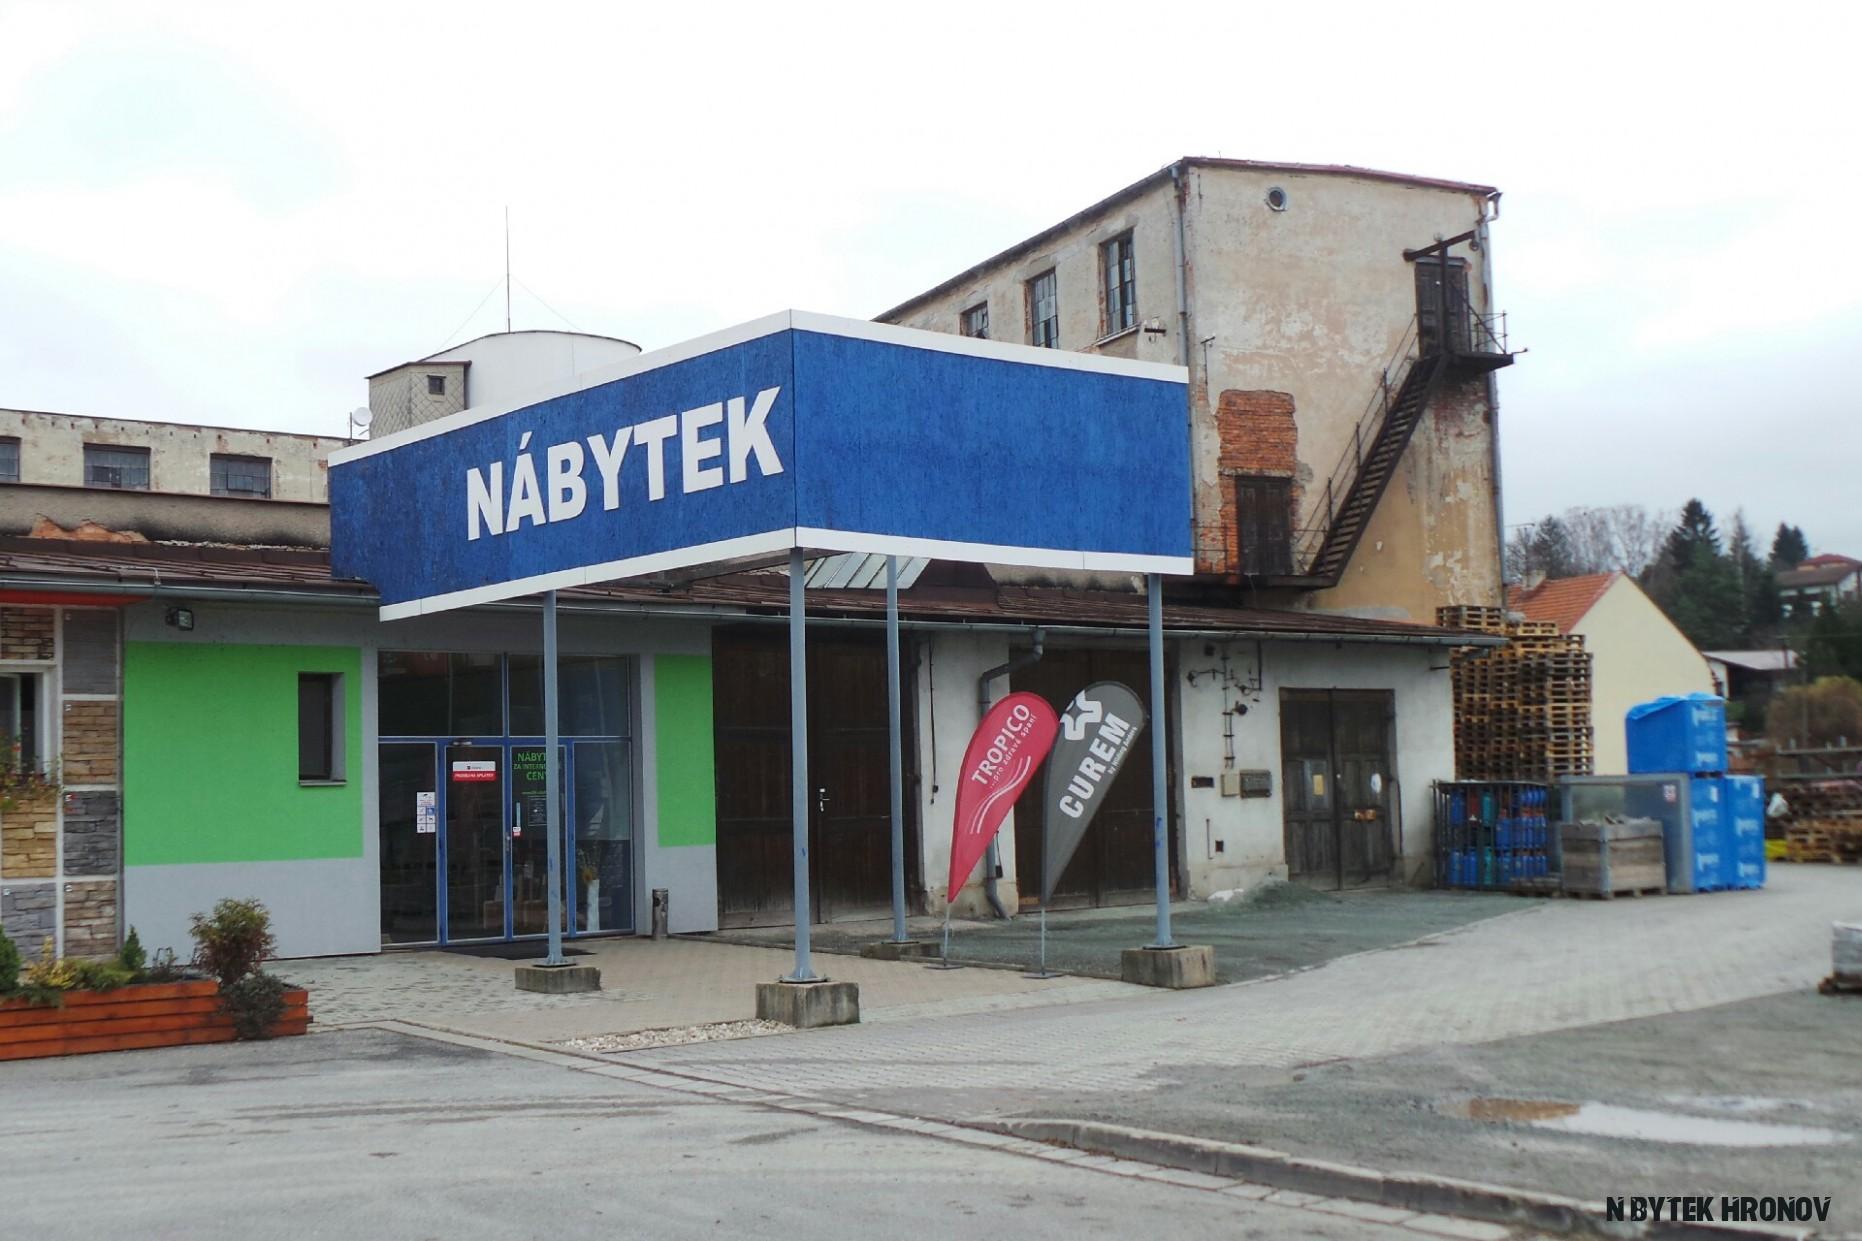 DK-obchod.cz - nábytek (Hronov) • Firmy.cz